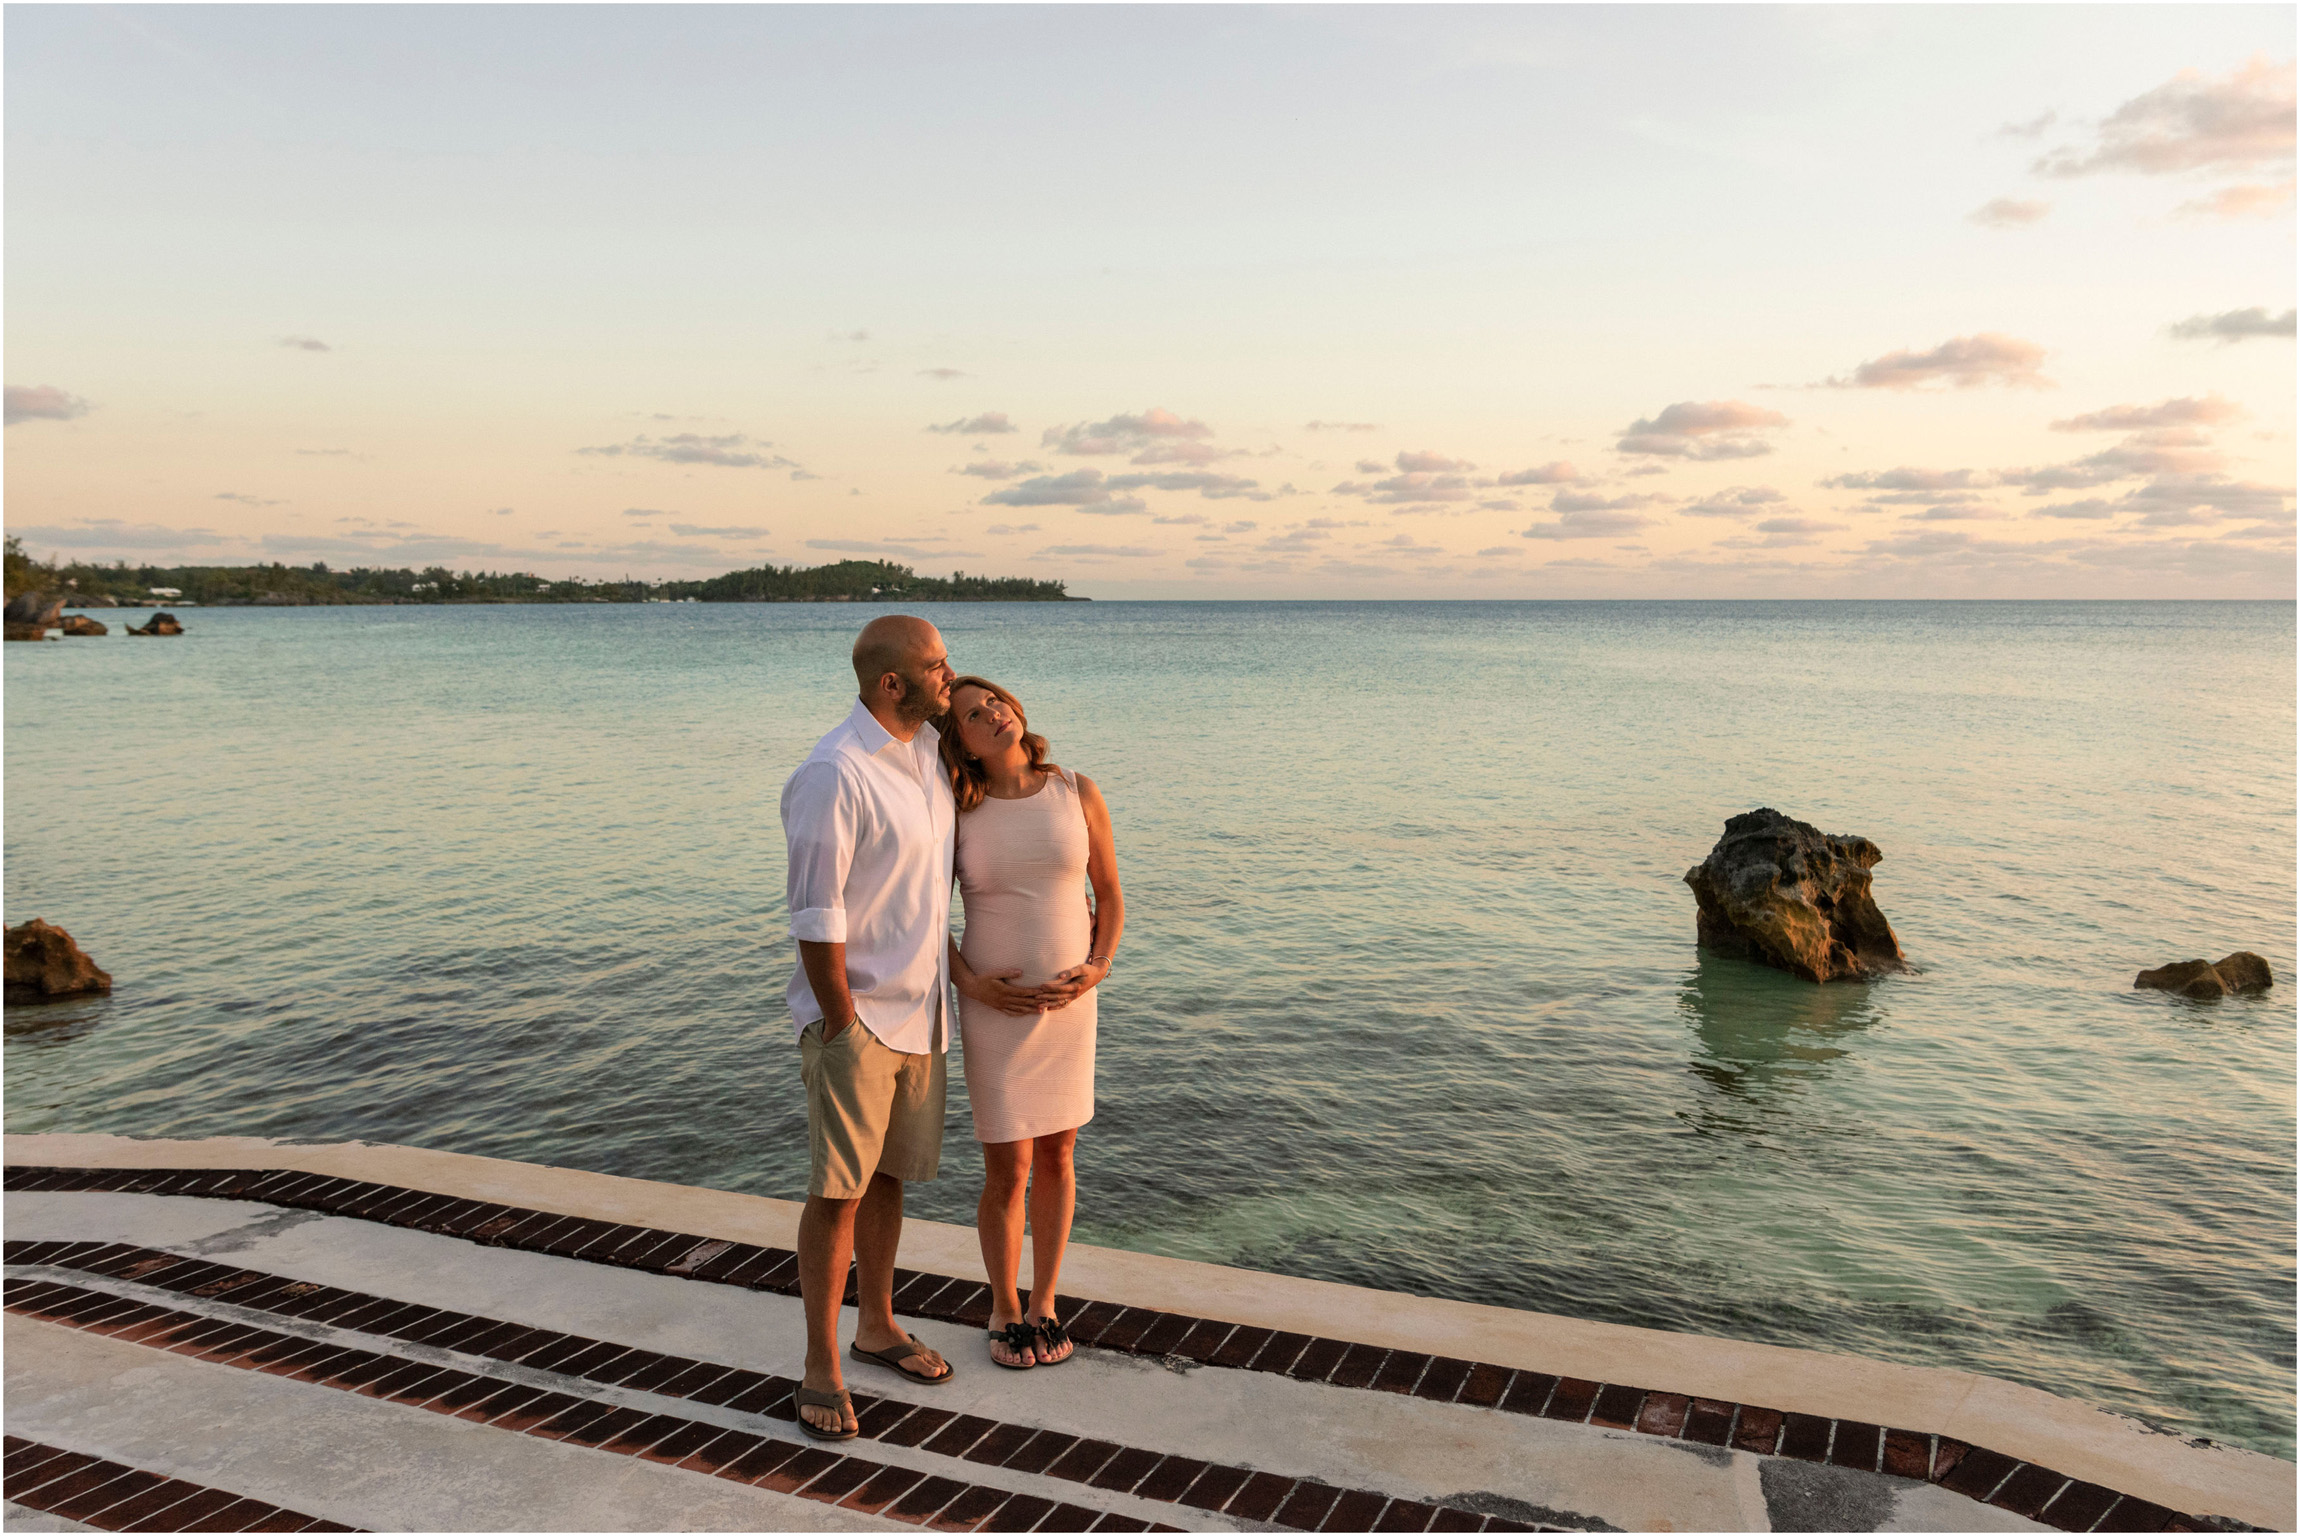 ©FianderFoto_Bermuda Maternity Photographer_Elys Harbour_Ft Scaur_Airbnb_Victoria_Mike_029.jpg